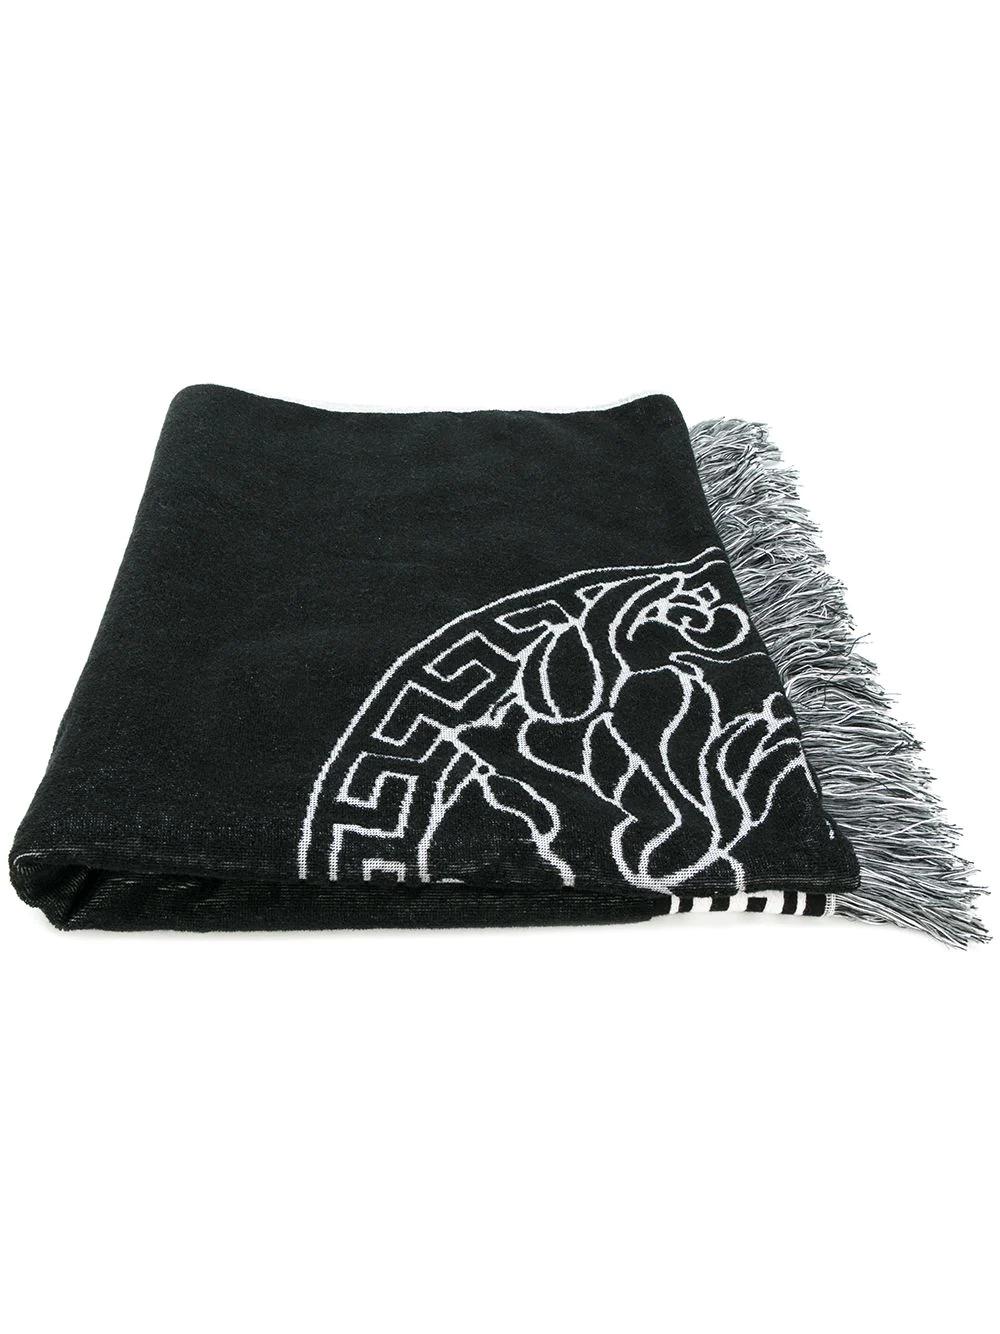 Versace | пляжное полотенце 'Medusa' | Clouty